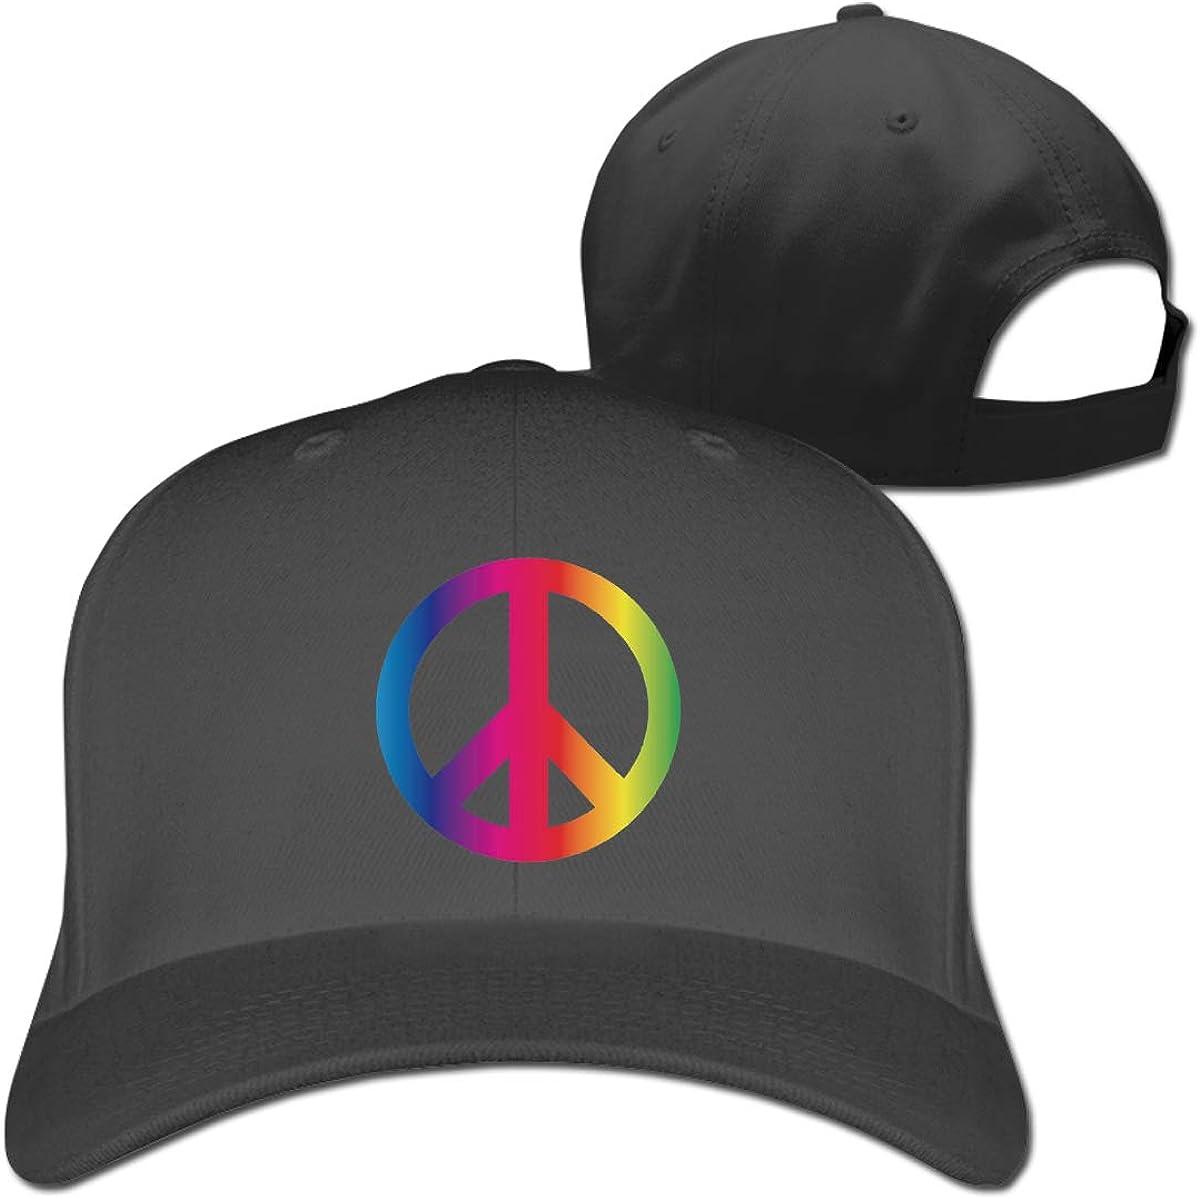 Rainbow Peace Sign Pride Fashion Adjustable Cotton Baseball Caps Trucker Driver Hat Outdoor Cap Black